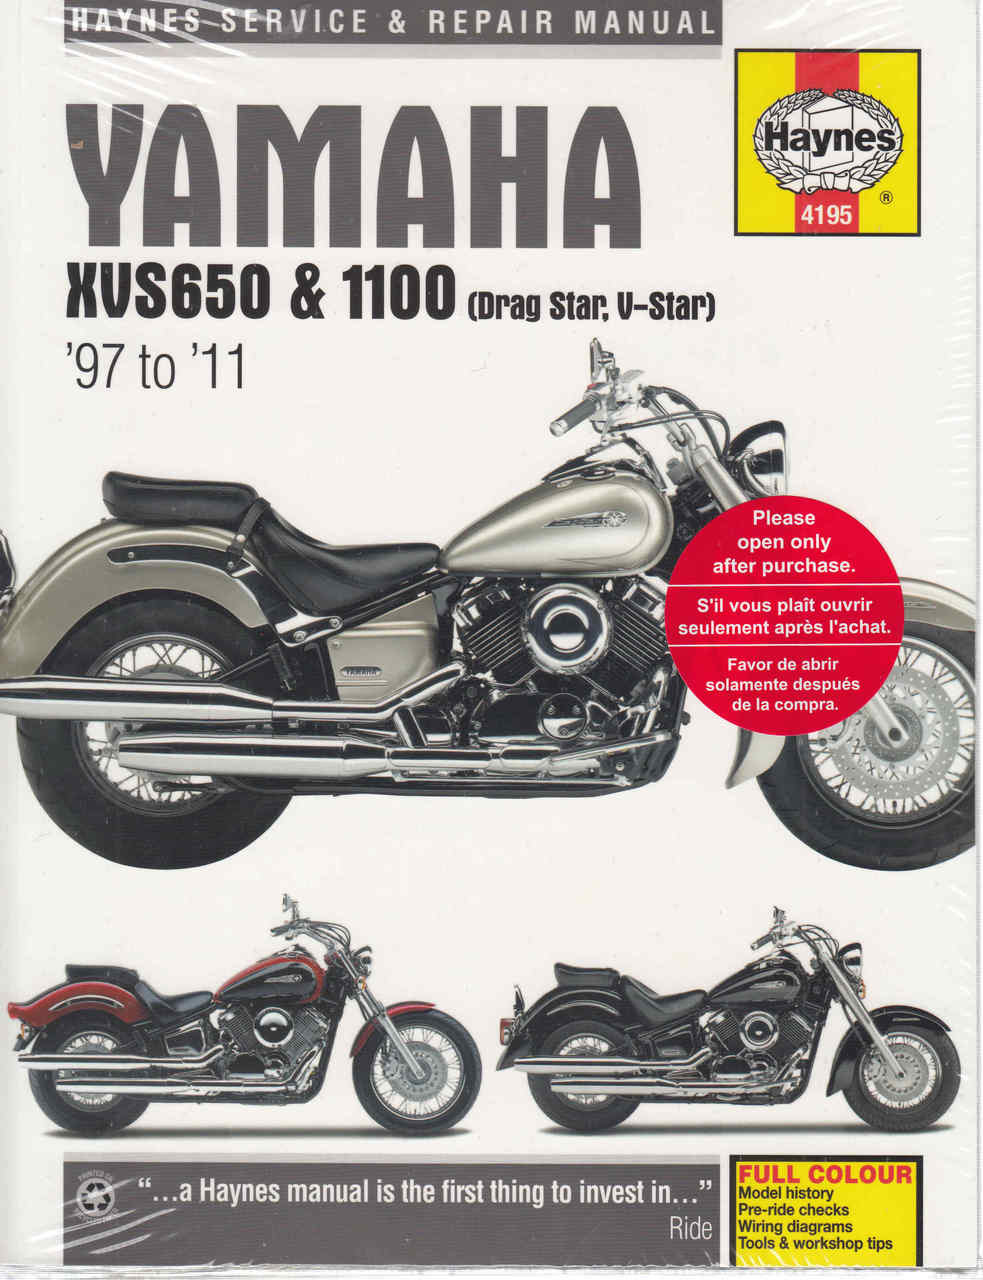 Yamaha Xvs650 Amp Xvs1100 Drag Star V 1997 2005 Workshop Wiring Diagram 1100 And 2011 Manual